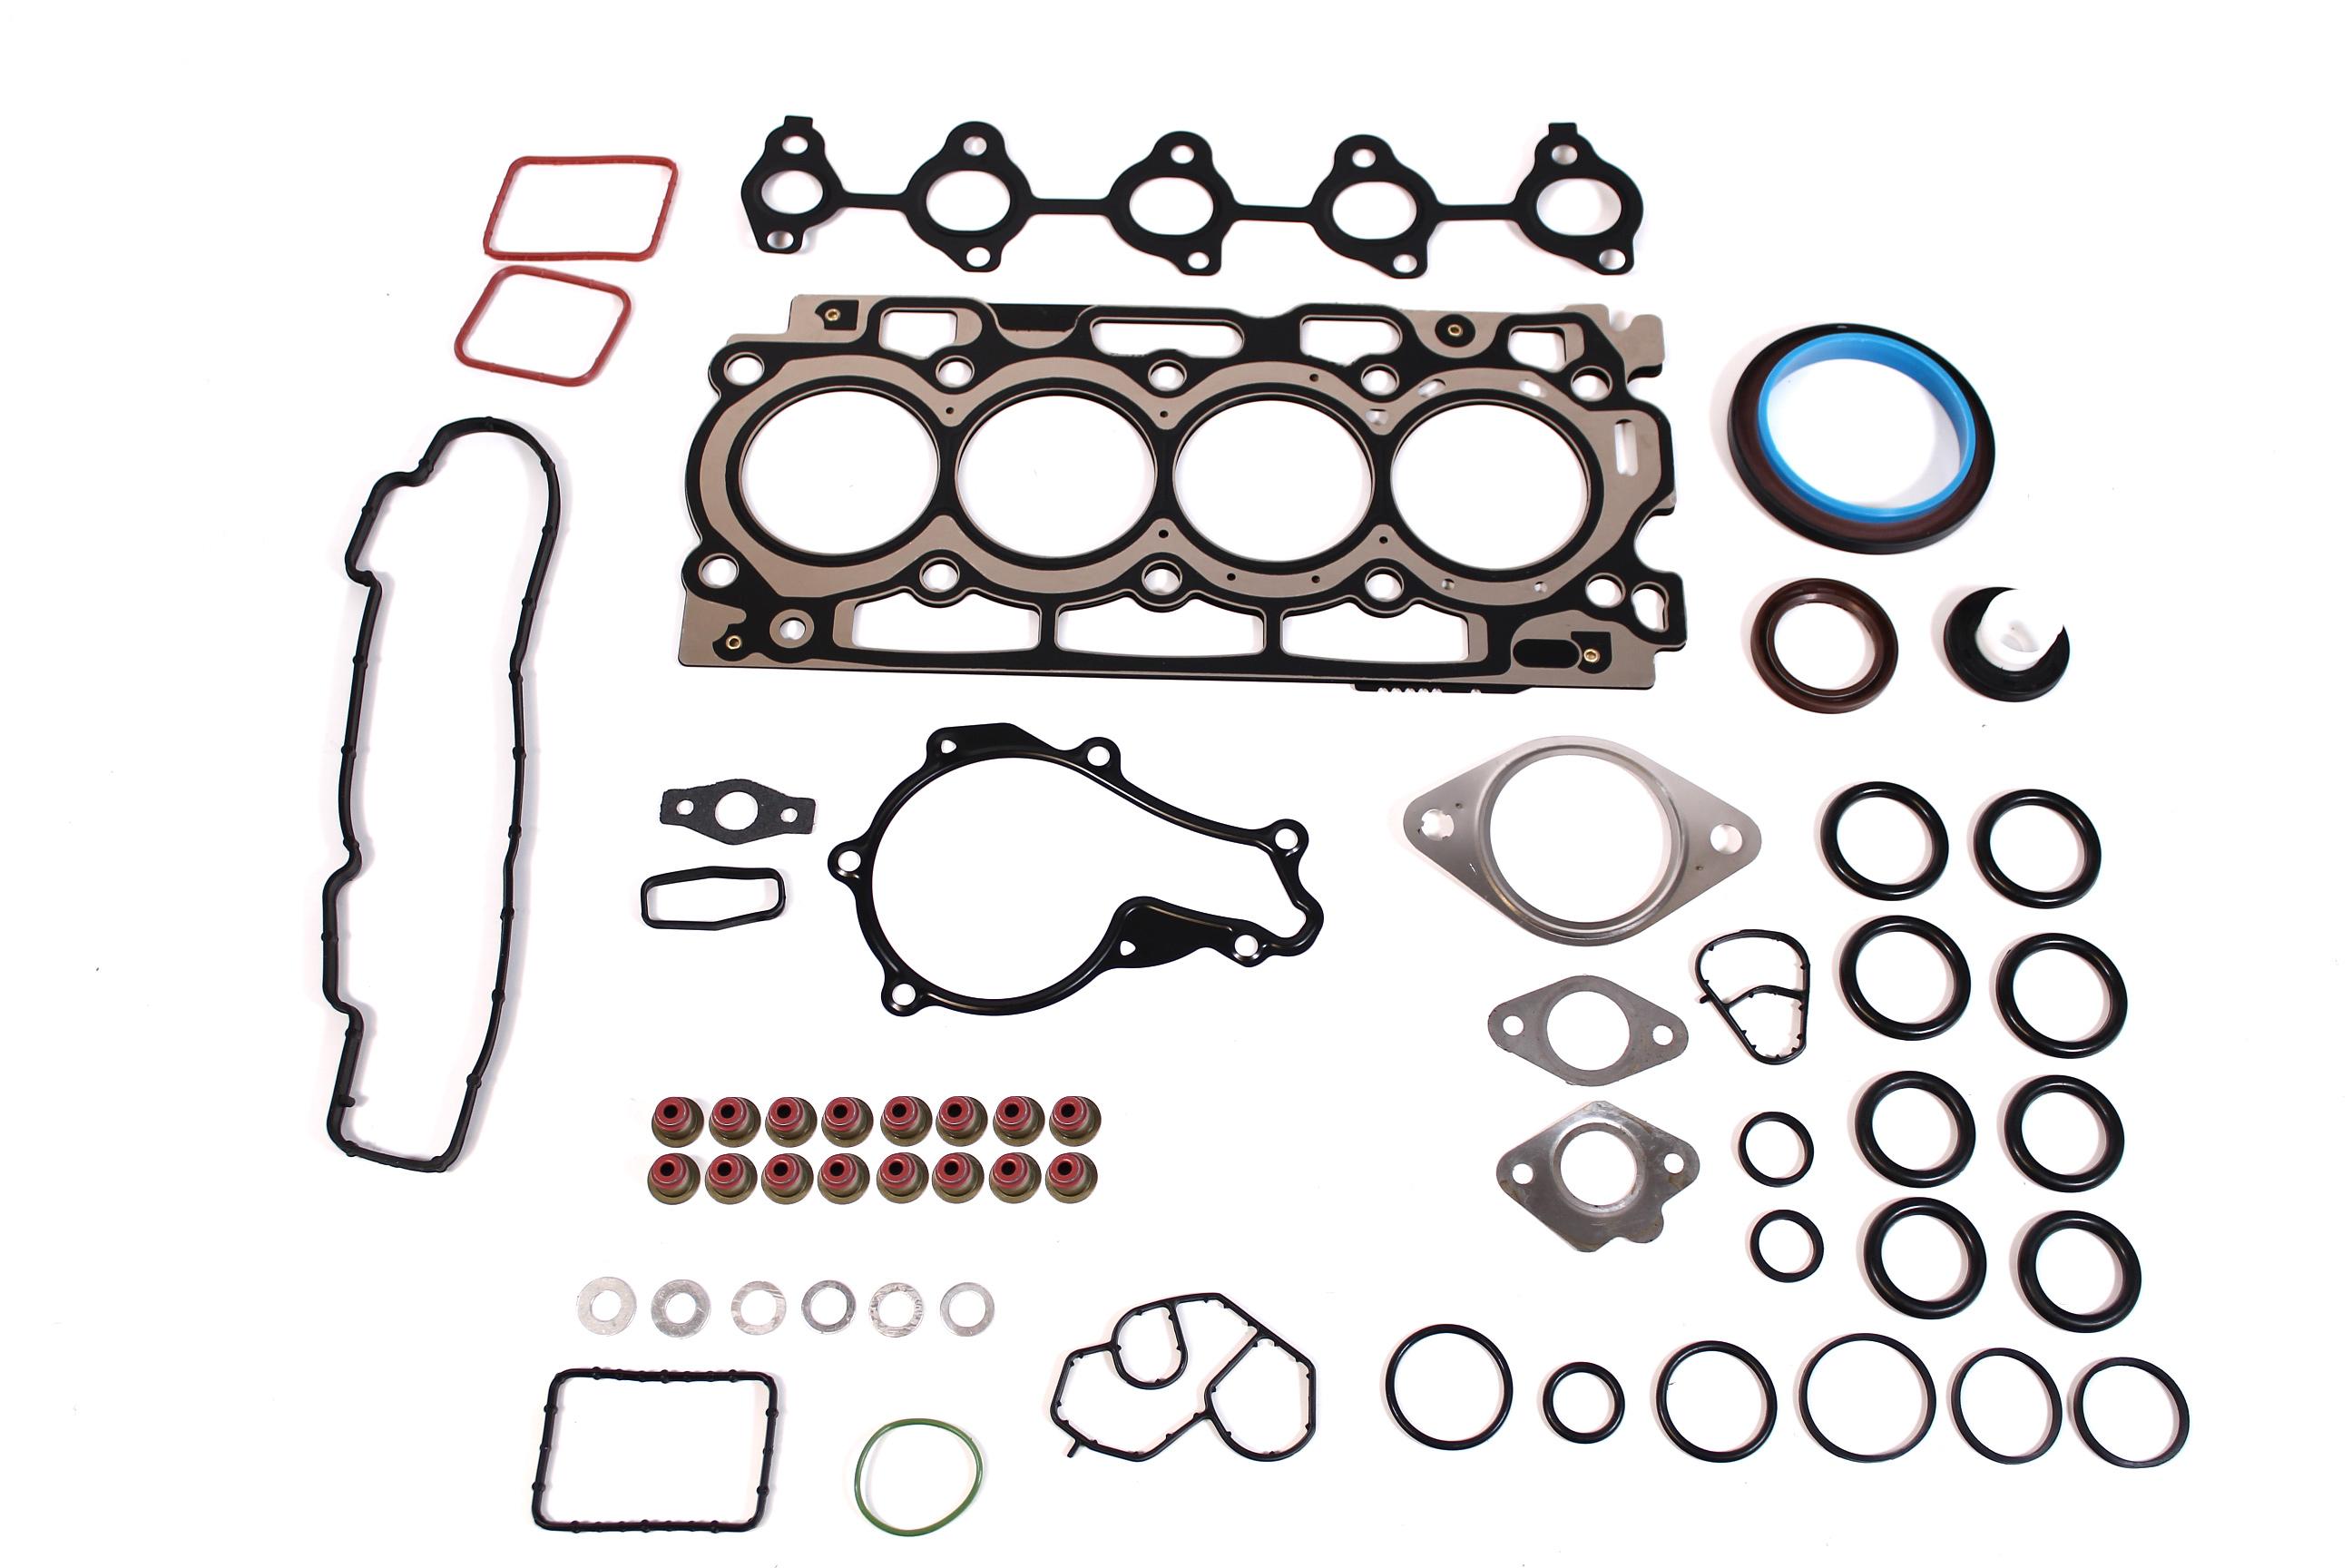 Dichtungssatz Zylinderkopfdichtung Ford C-Max Fiesta 1,6 TDCI GPDB GPDC HHDA NEU